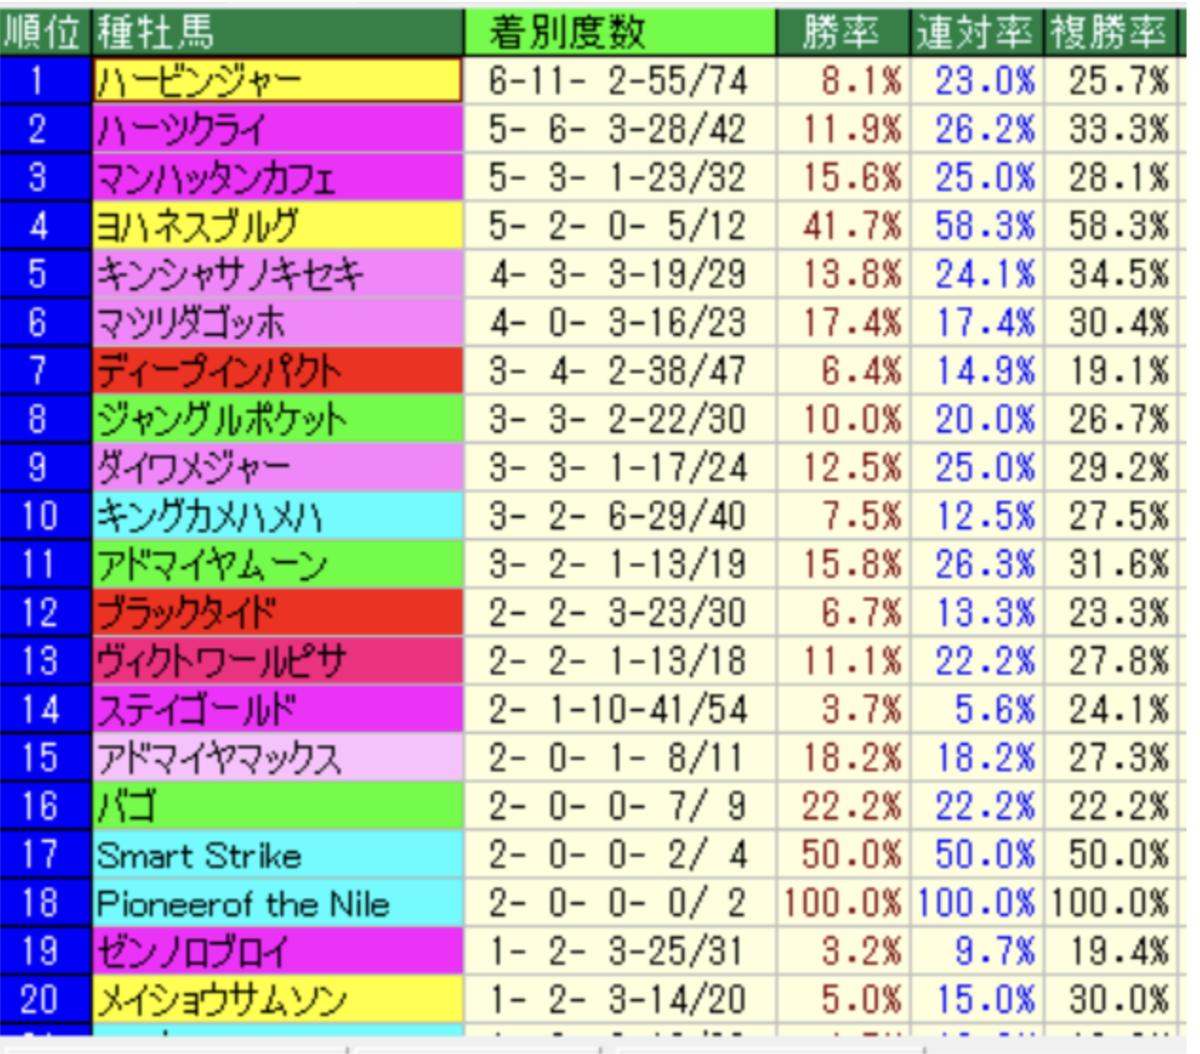 f:id:ogusankako:20190724174451p:plain